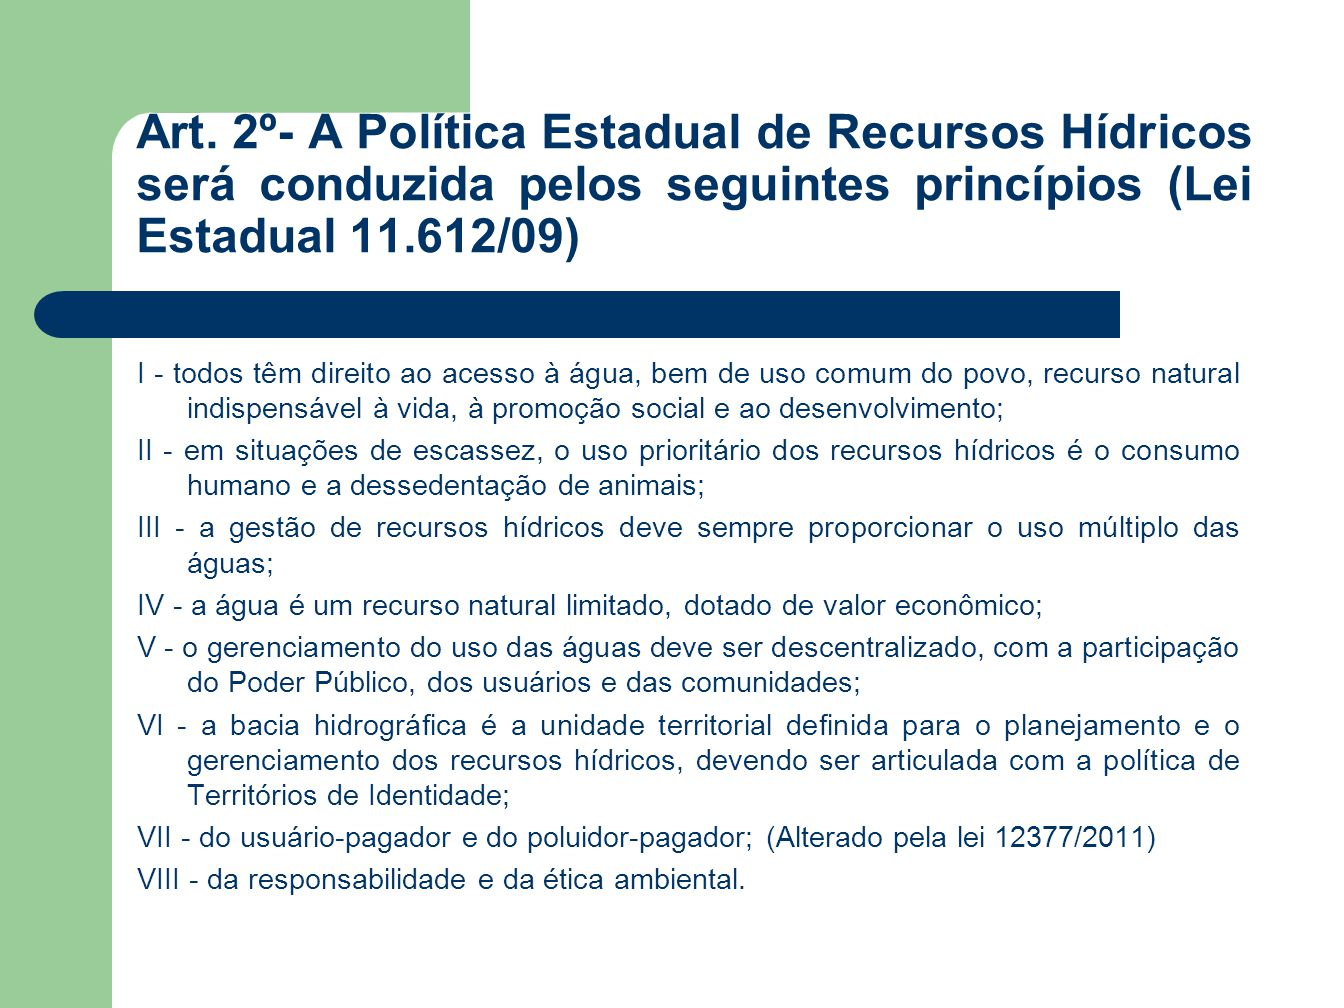 Art. 2º- A Política Estadual de Recursos Hídricos será conduzida pelos seguintes princípios (Lei Estadual 11.612/09)